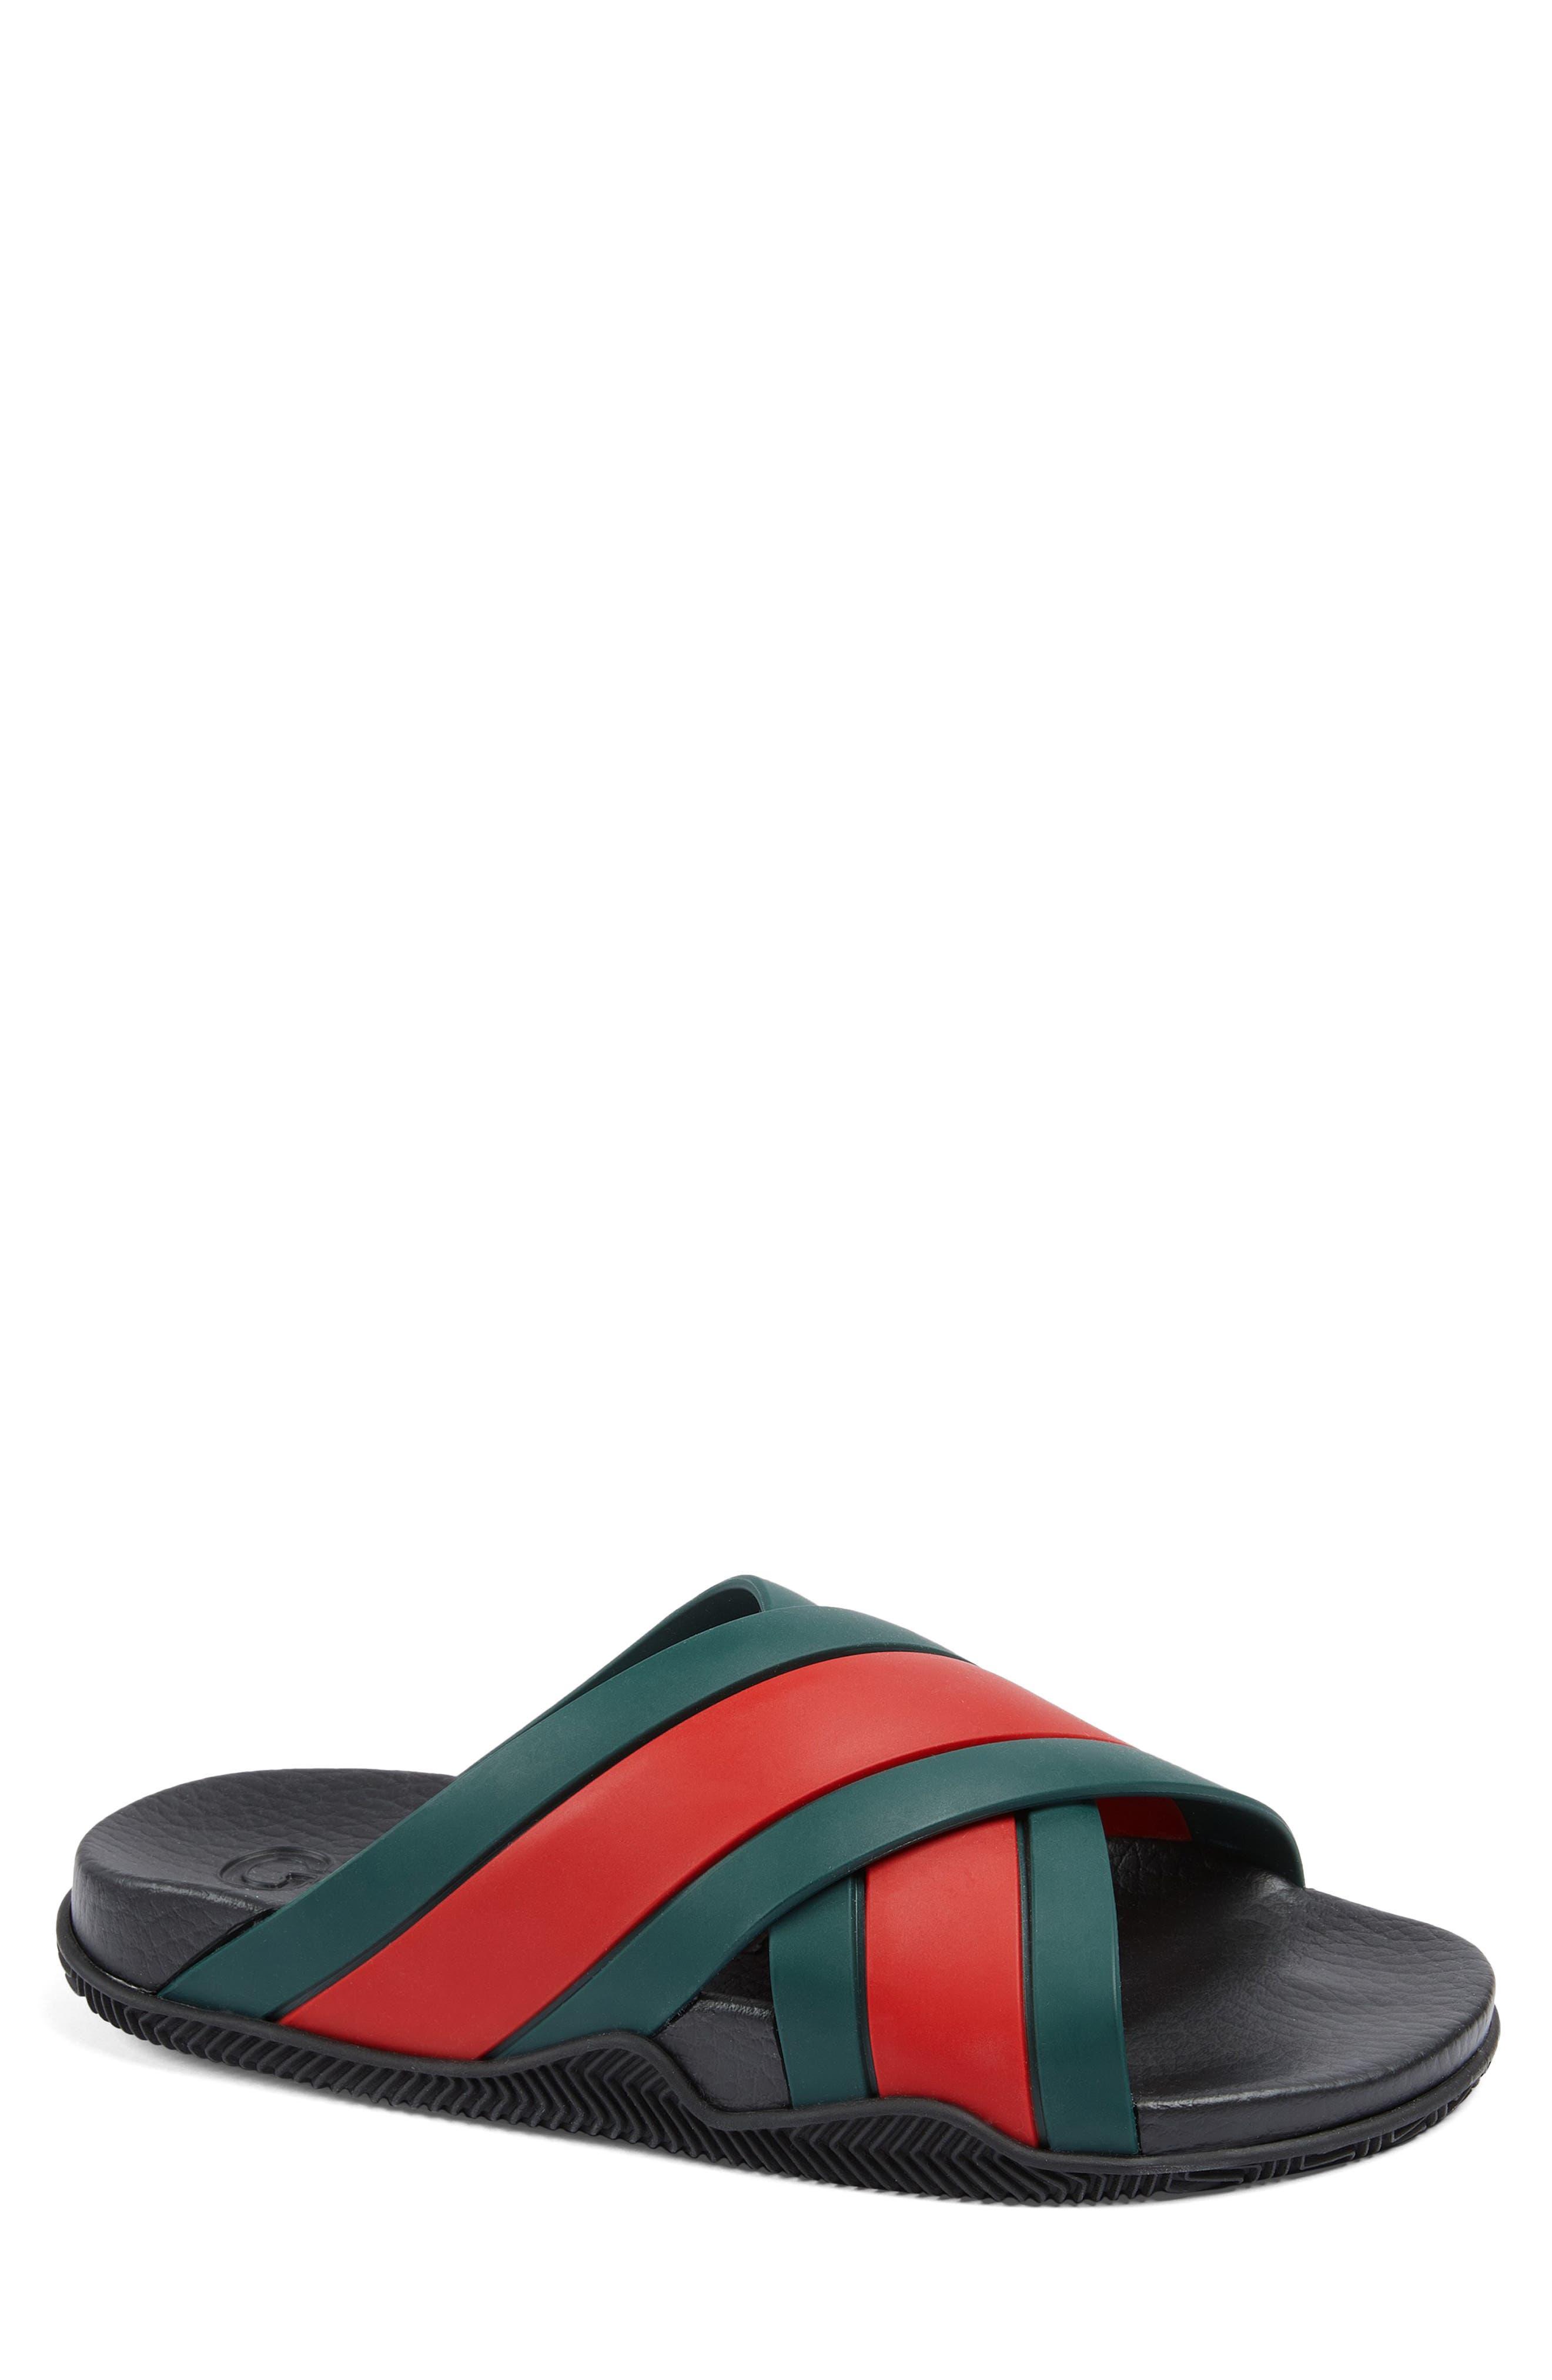 Men's Gucci Sandals, Slides \u0026 Flip